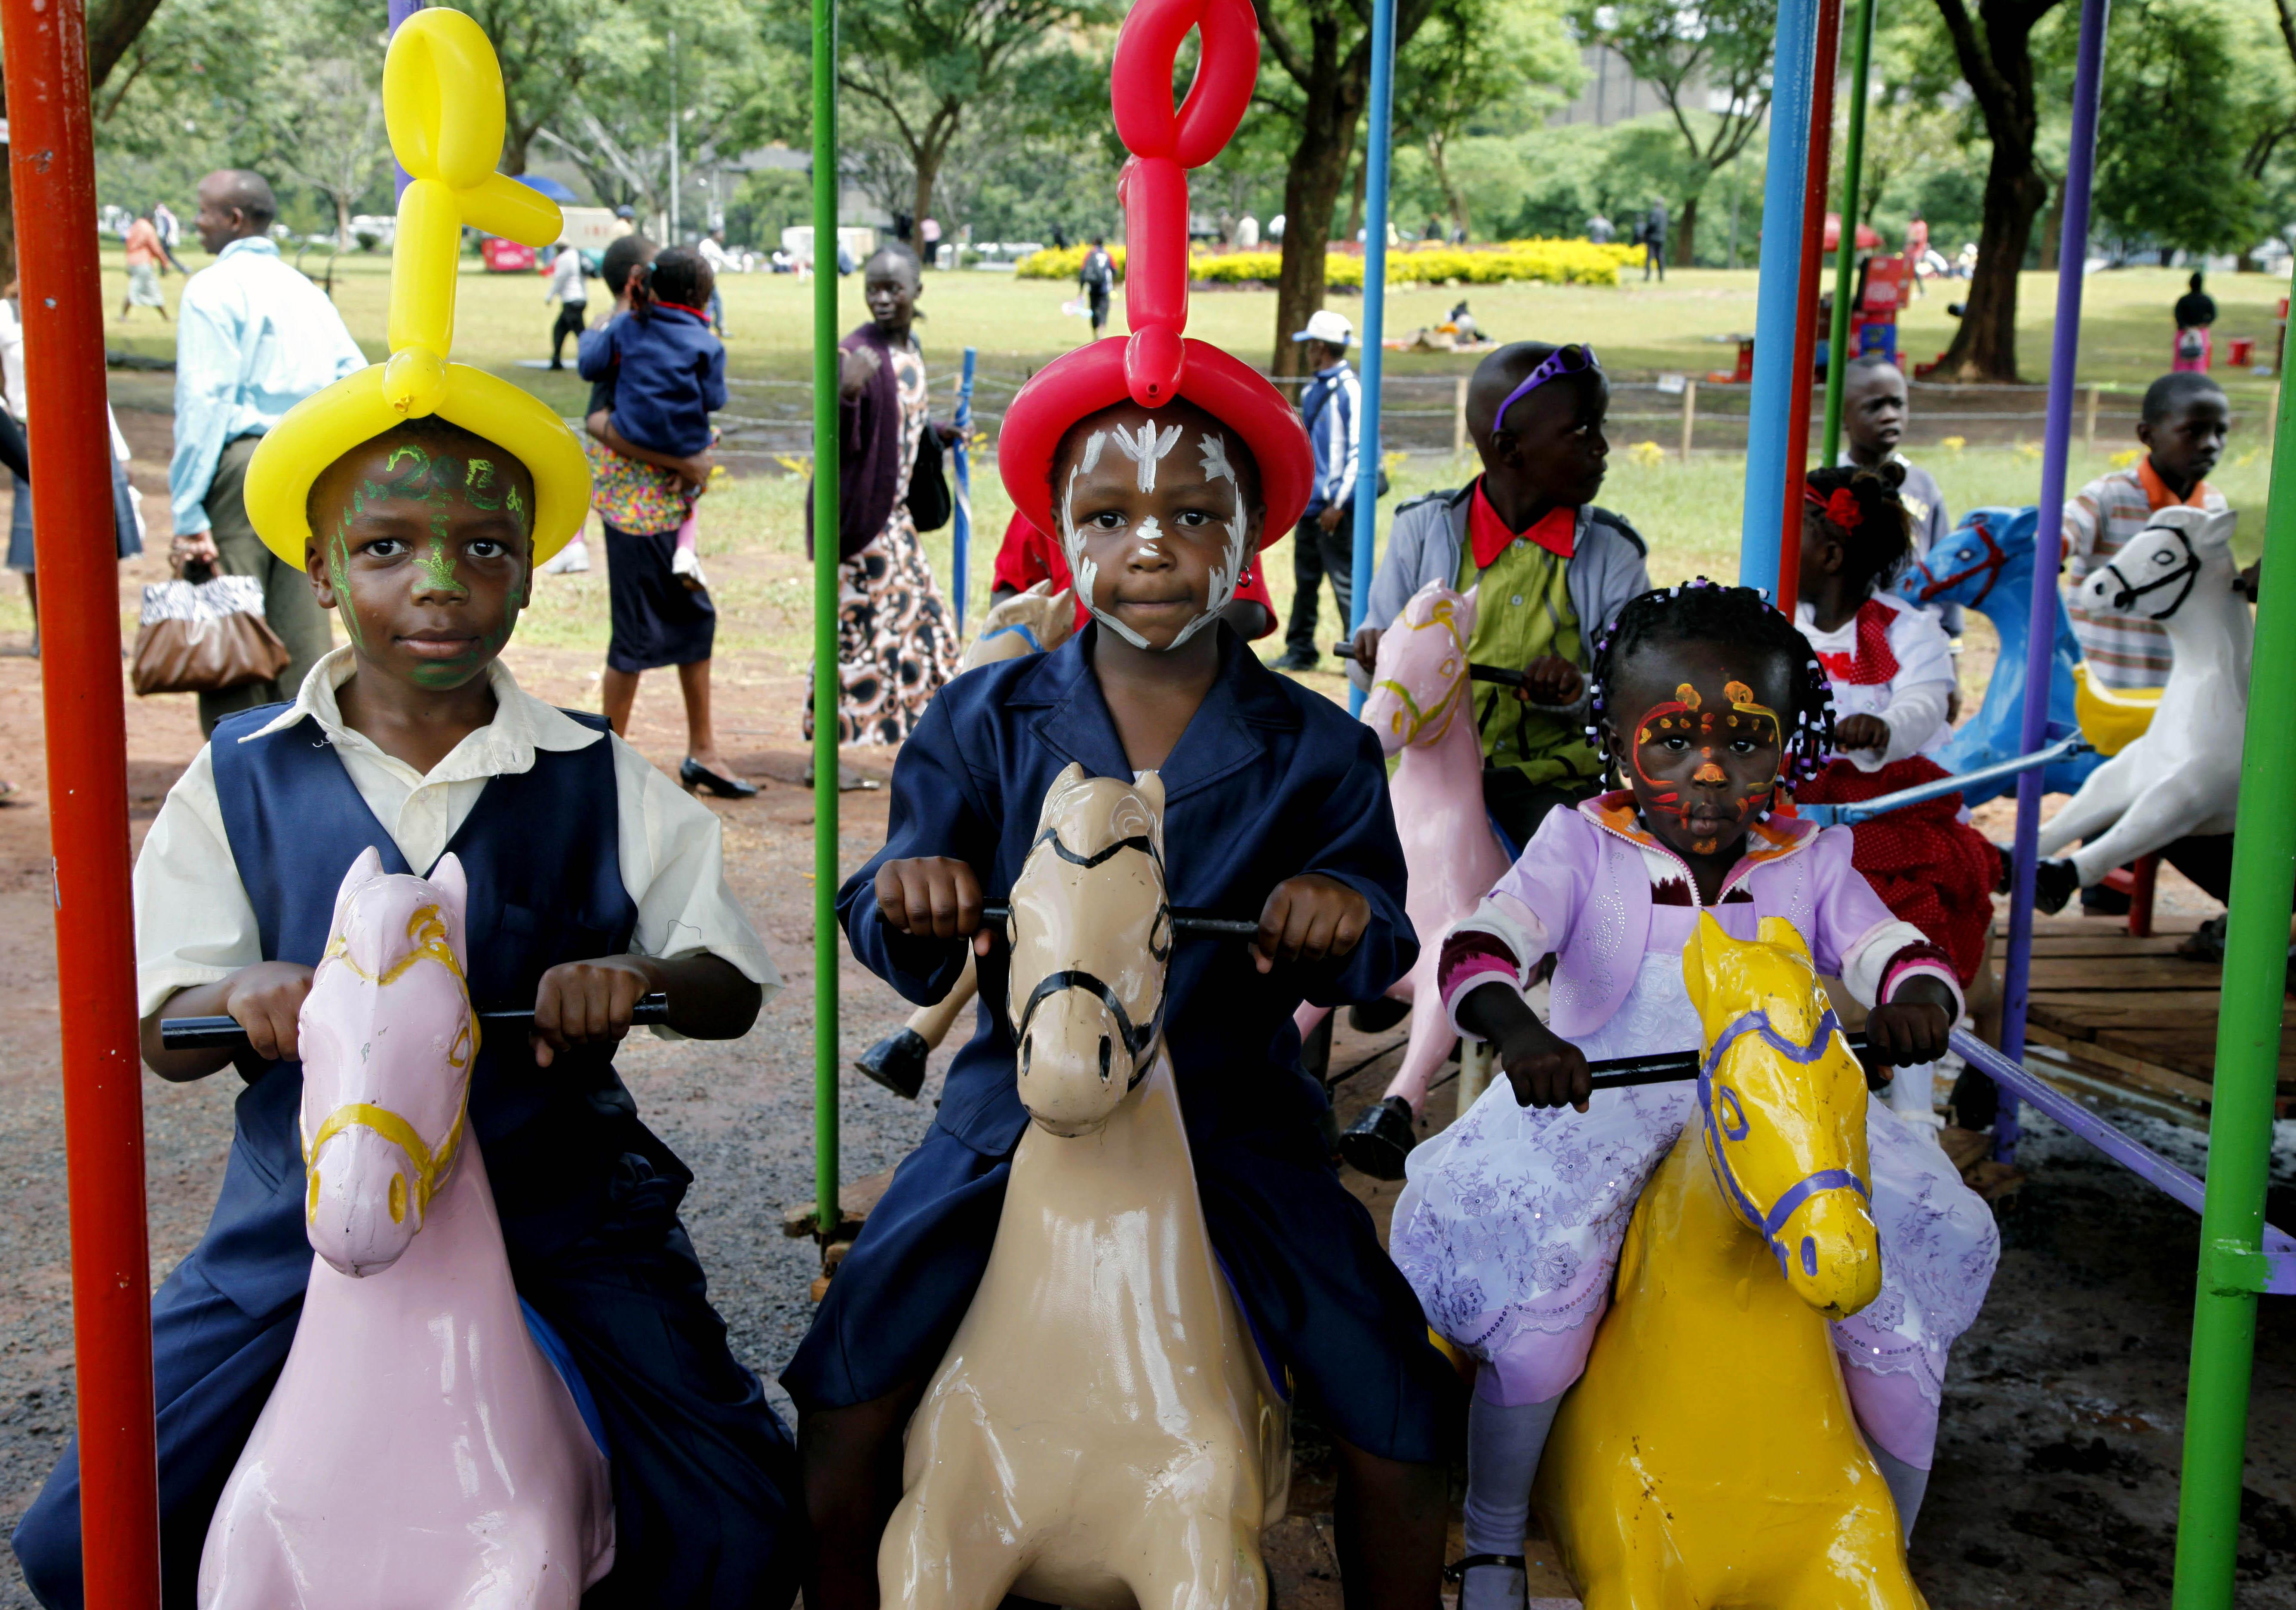 "<div class=""meta image-caption""><div class=""origin-logo origin-image none""><span>none</span></div><span class=""caption-text"">Kenyan children ride a carousel as families gather to celebrate the new year at Uhuru Park, Nairobi, Kenya. (AP)</span></div>"